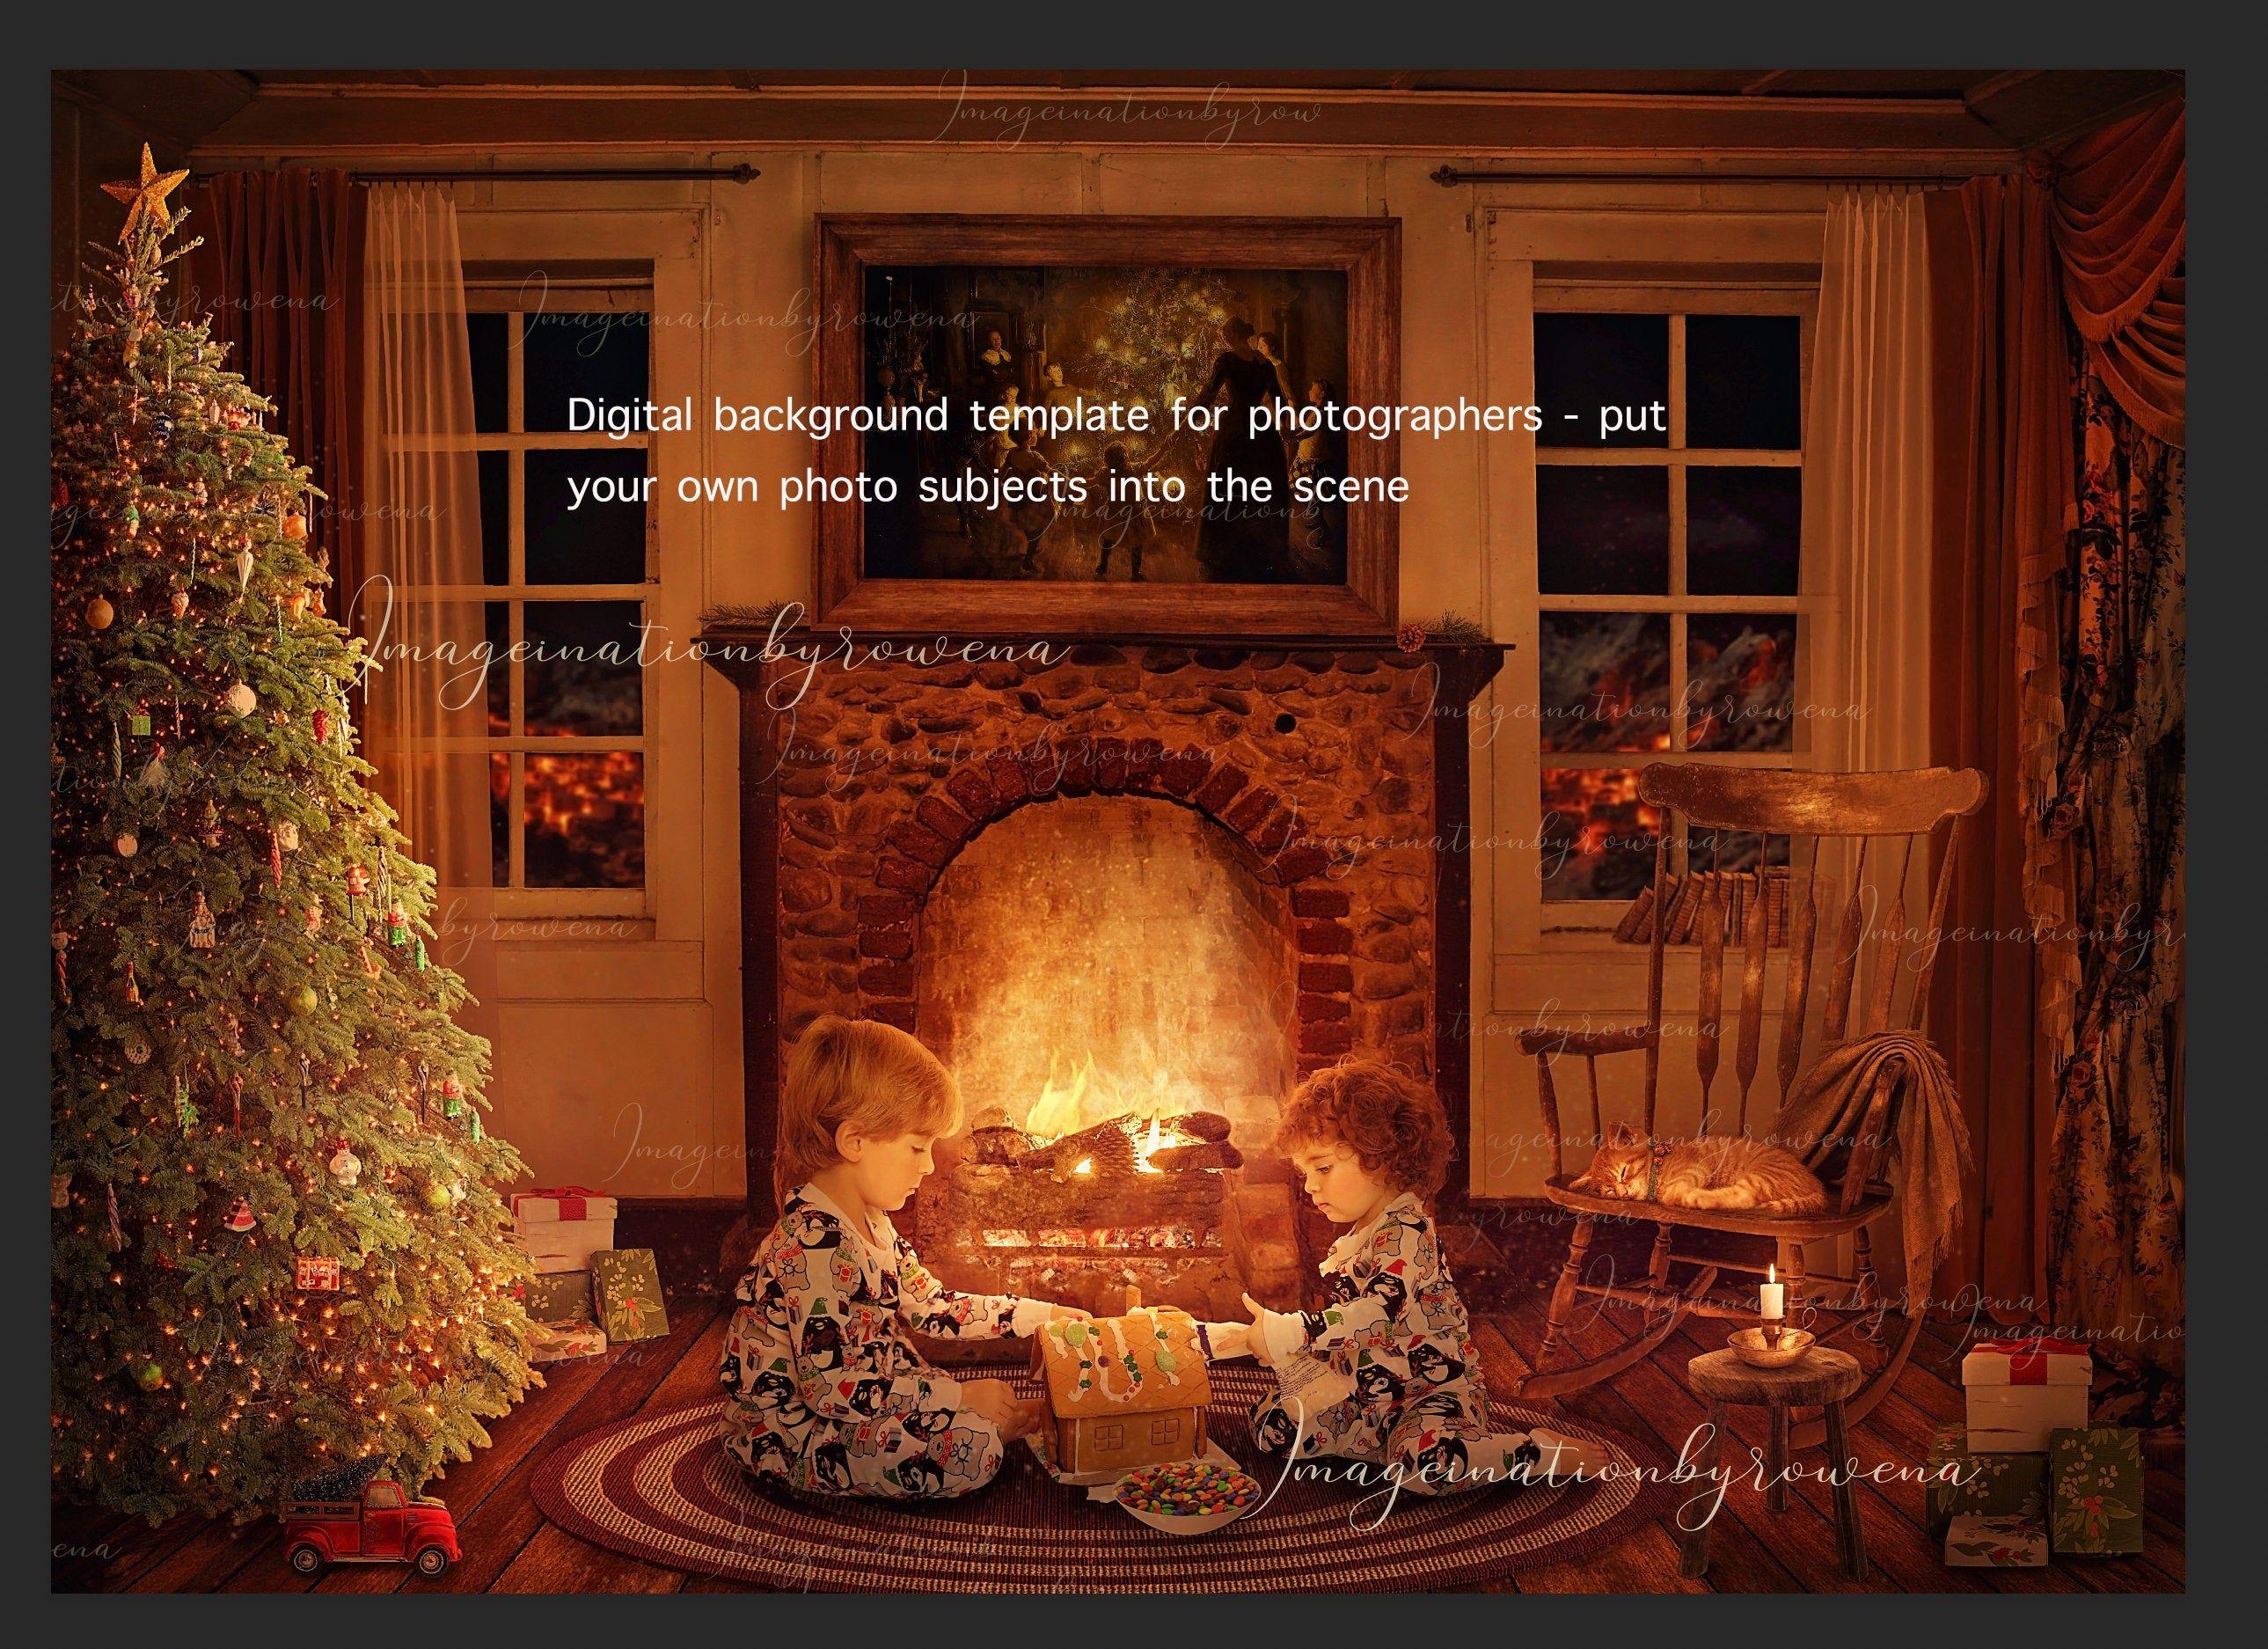 Festive Christmas Vintage Room With Fireplace Digital Etsy In 2020 Digital Backdrops Vintage Christmas Digital Art Supplies